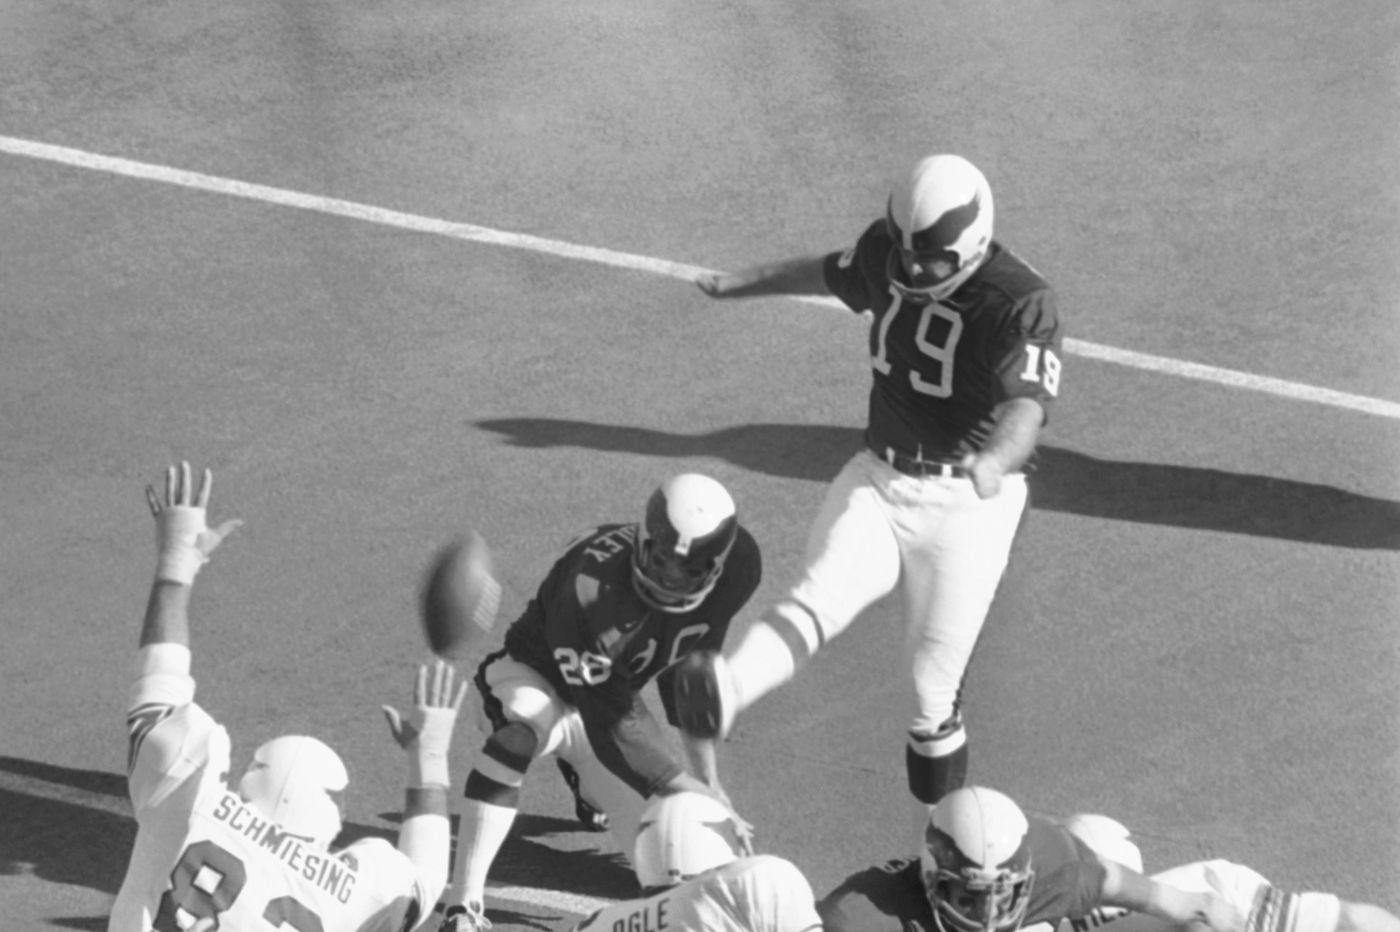 Former Eagles kicker Tom Dempsey dies of coronavirus at 73; set team and NFL field goal records